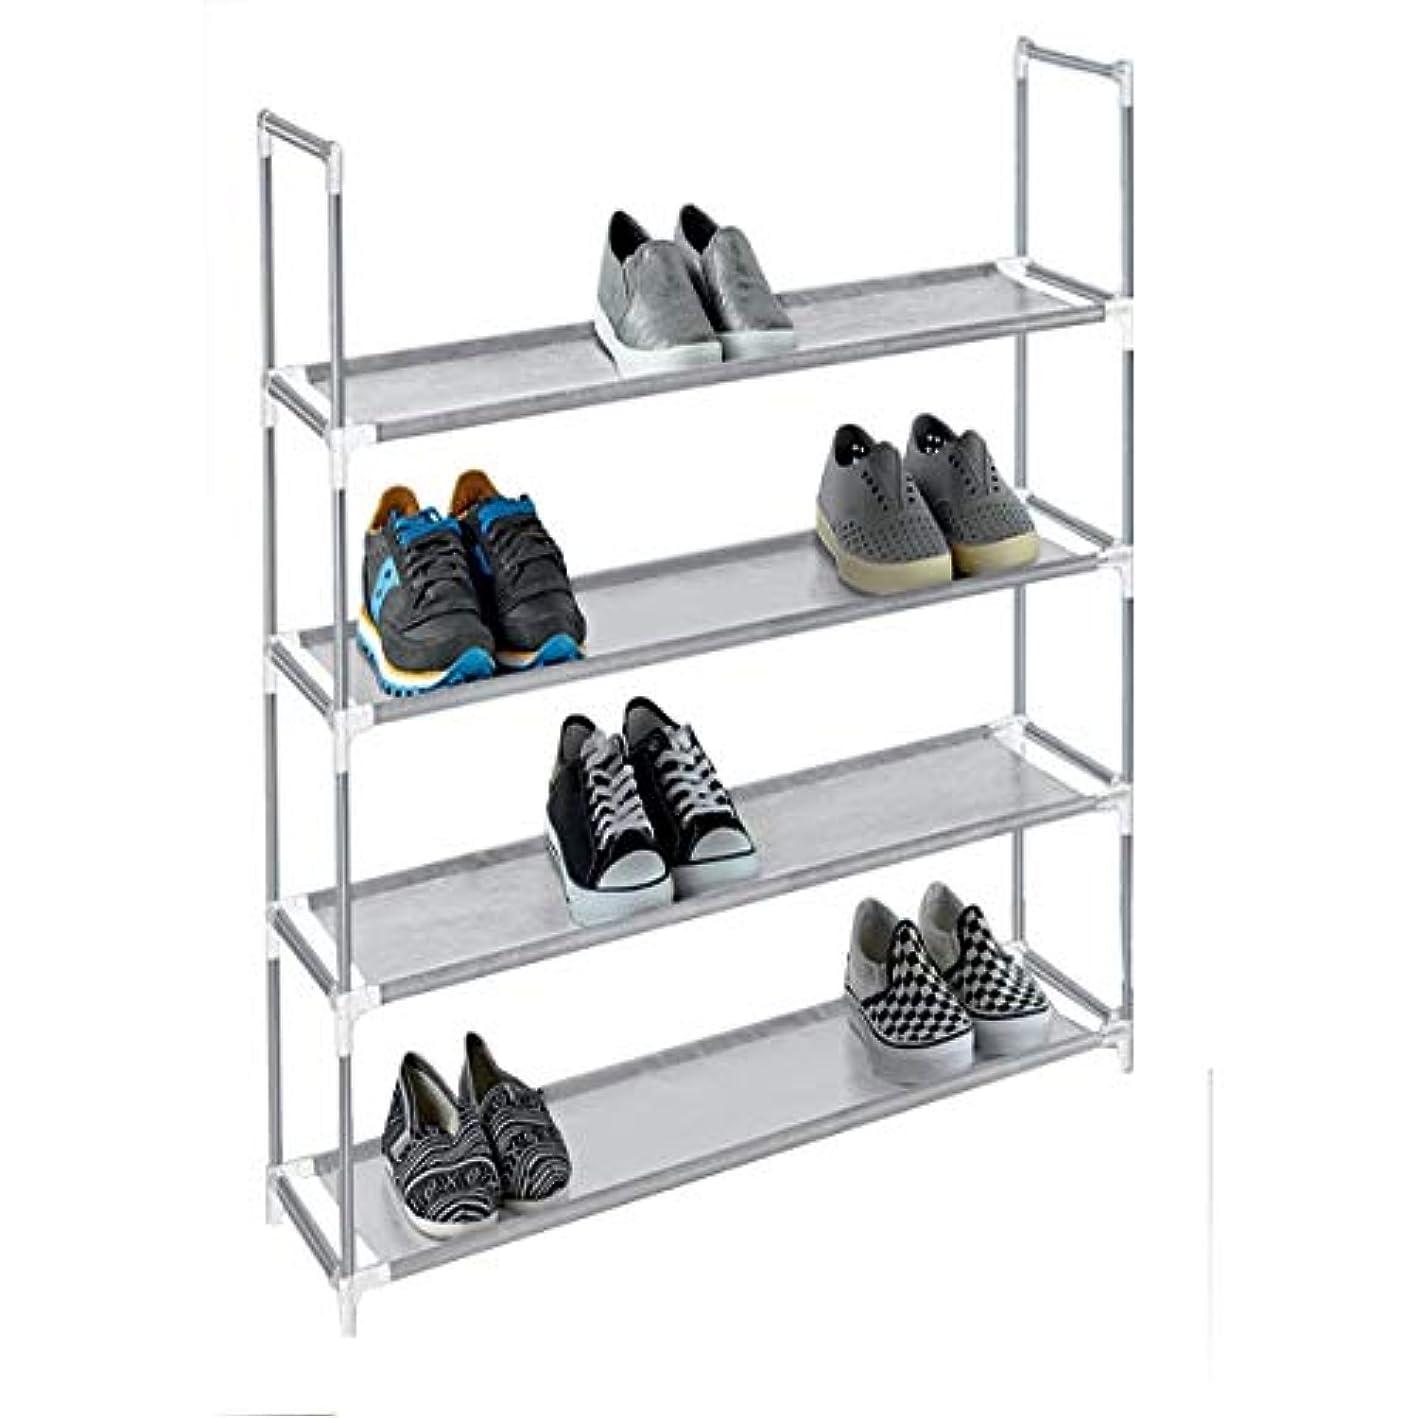 American Dream Home Goods Organizer 6920-GR Shoe Rack Grey ebldbl9640247